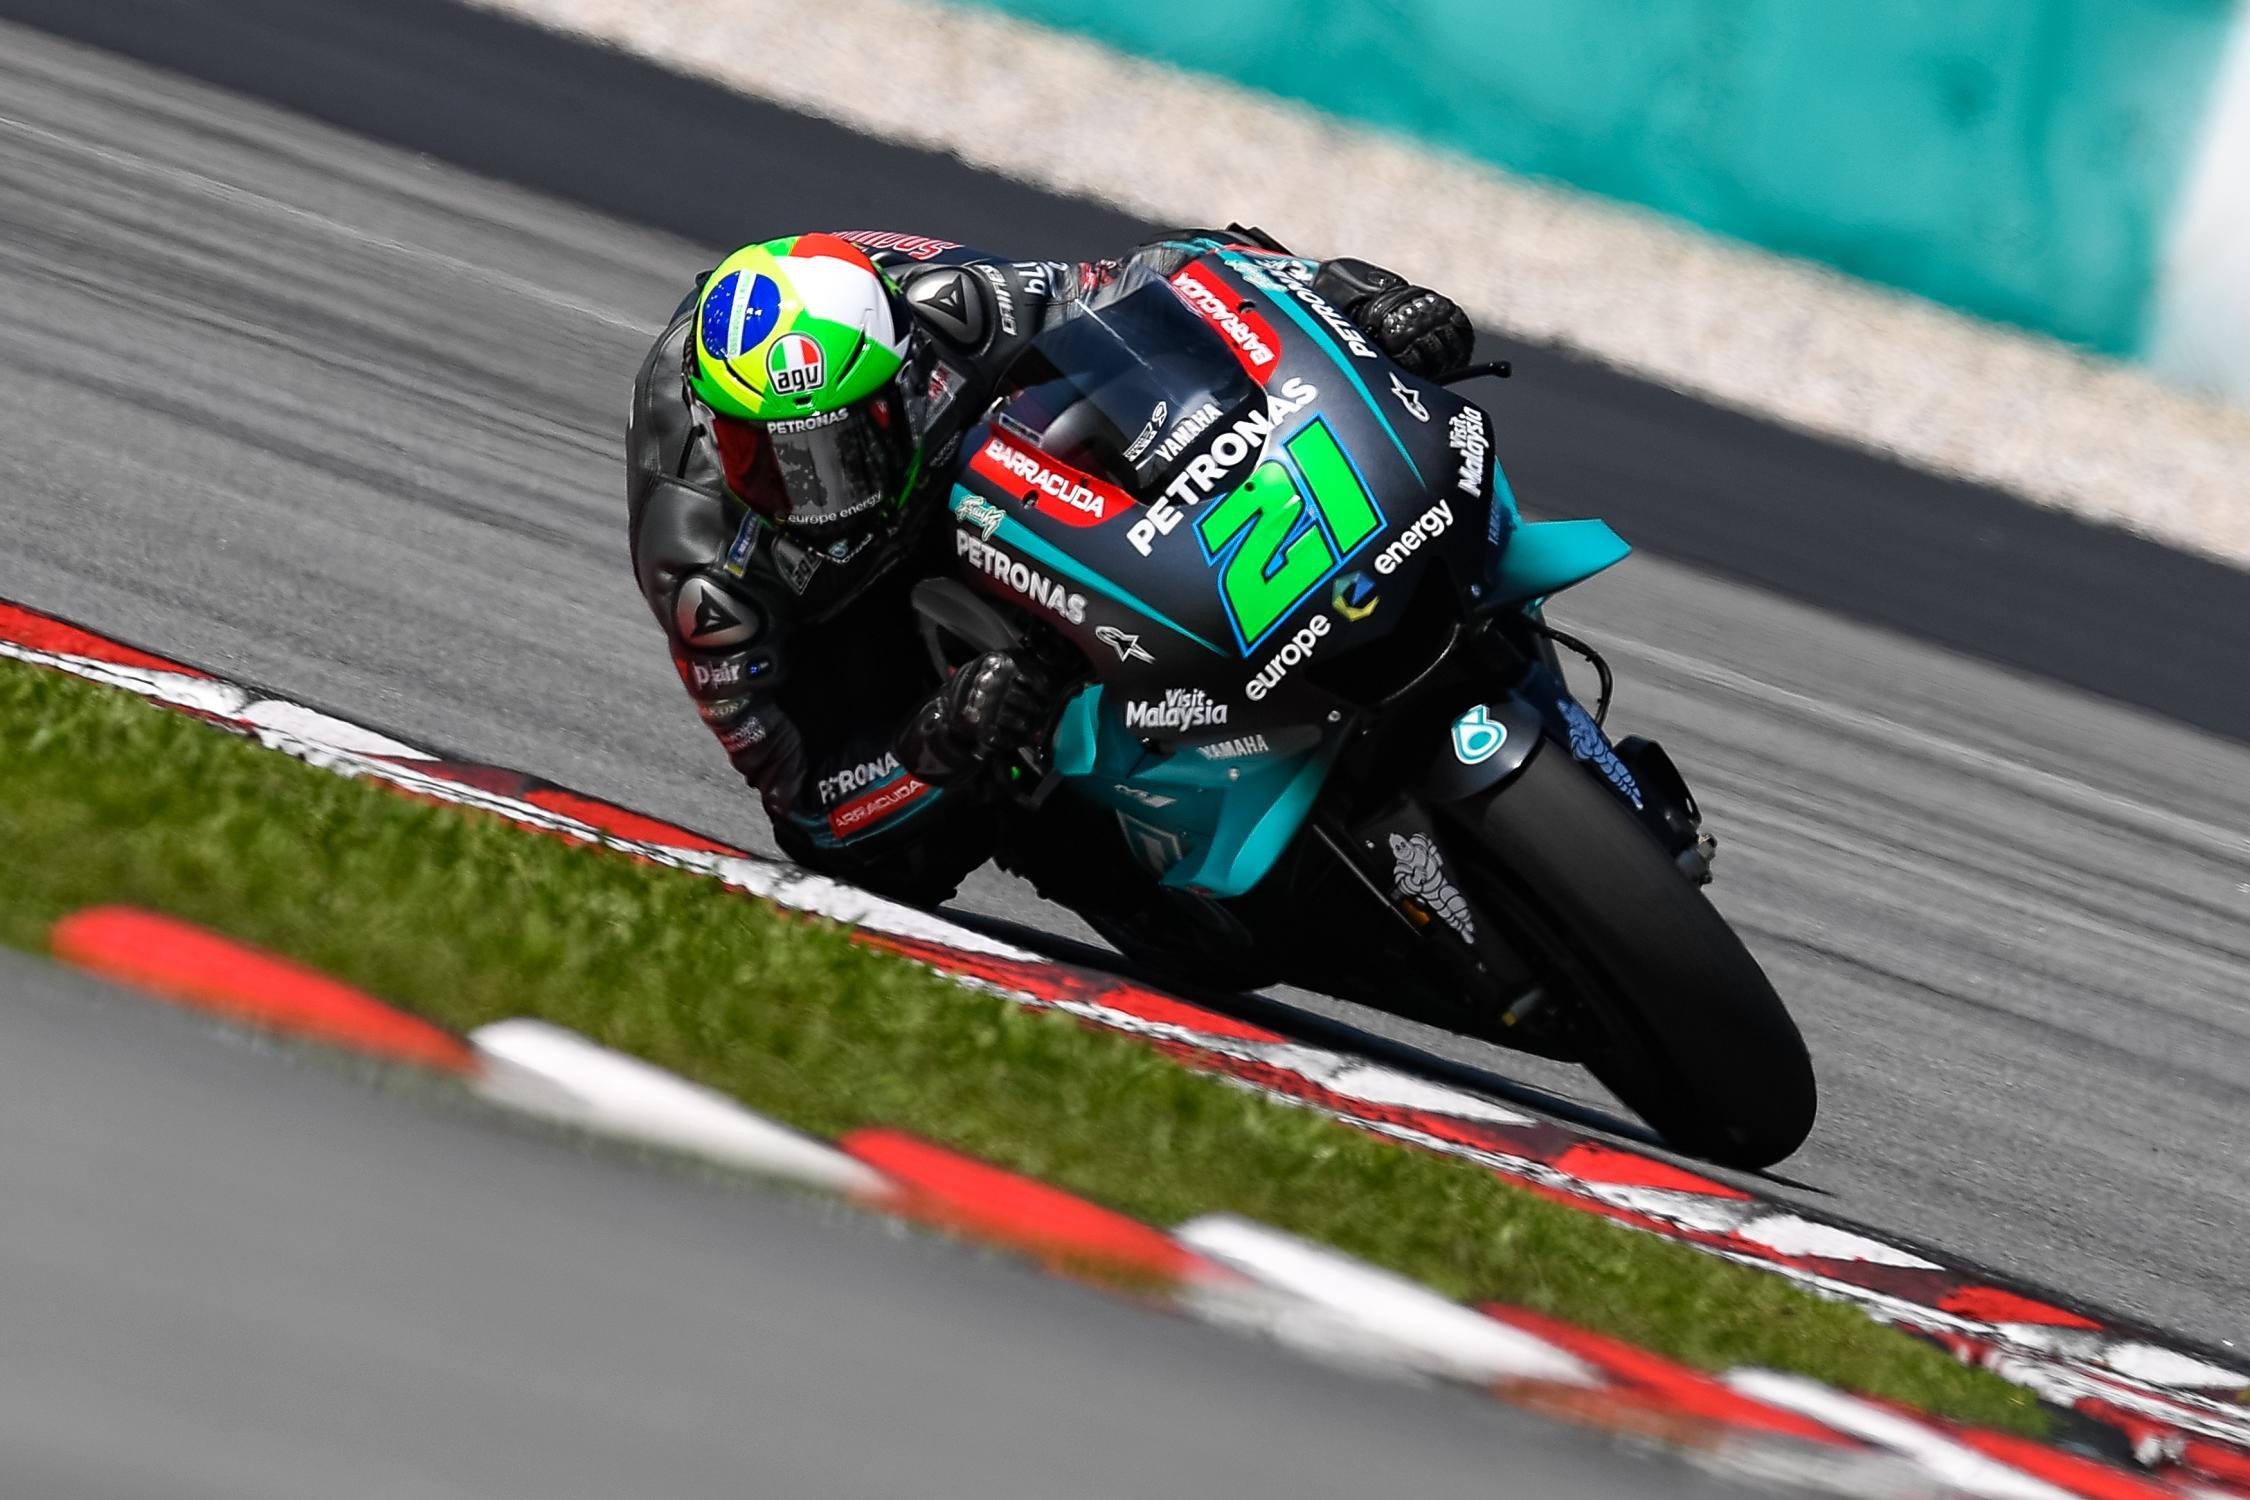 MOTO GP TESTS 2019 - Page 2 Franco-morbidelli-sepang-test-j1-motogp-2019